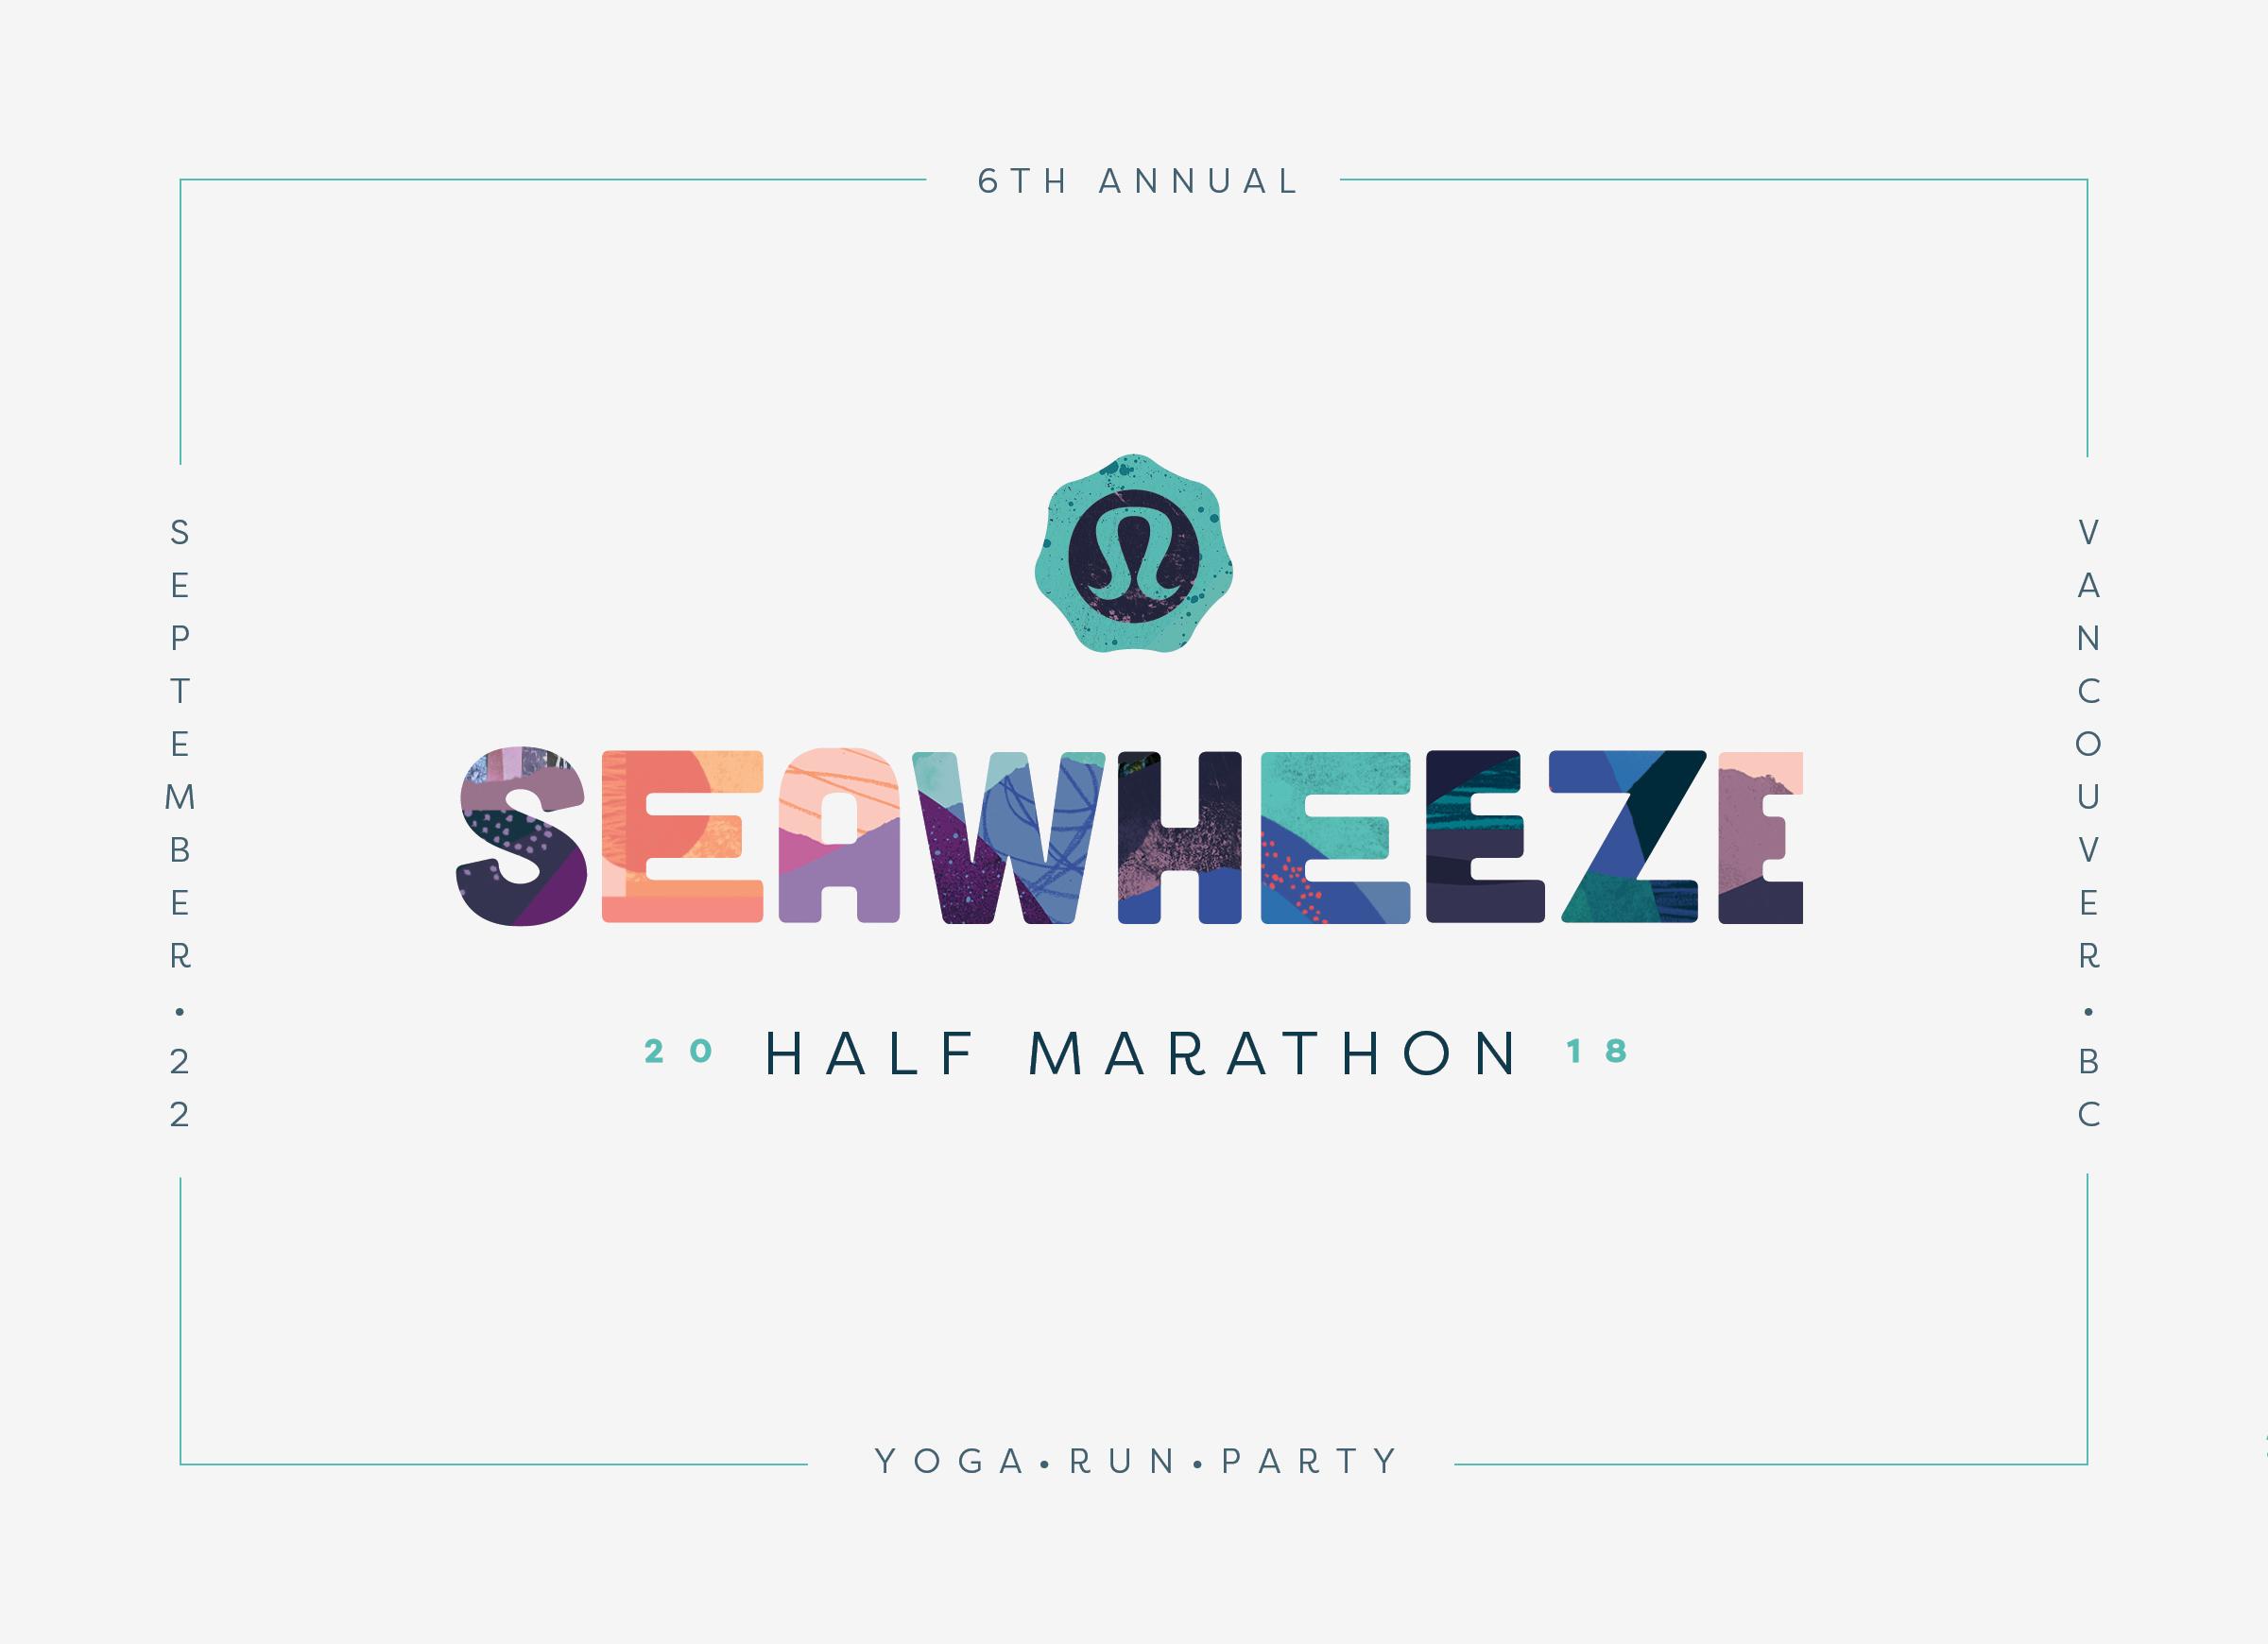 Branding and logo design for the 2018 lululemon seawheeze half marathon by freelance art director Veronica Stark.